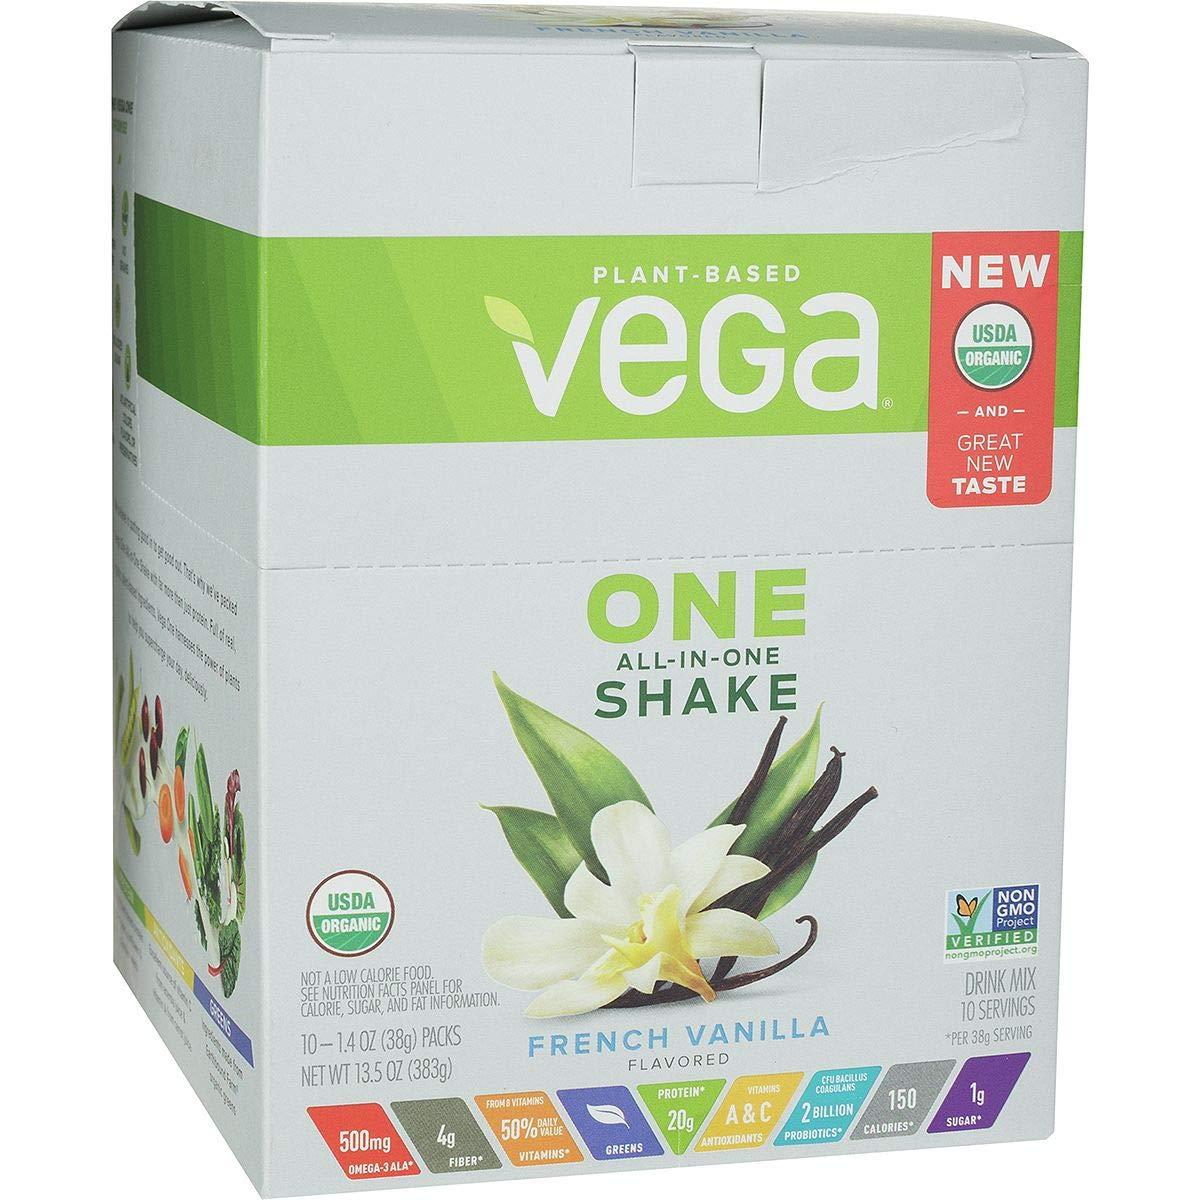 Vega, Protein Powder One Us French Vanilla Box Organic, 1.4 Ounce, 10 Pack by VEGA